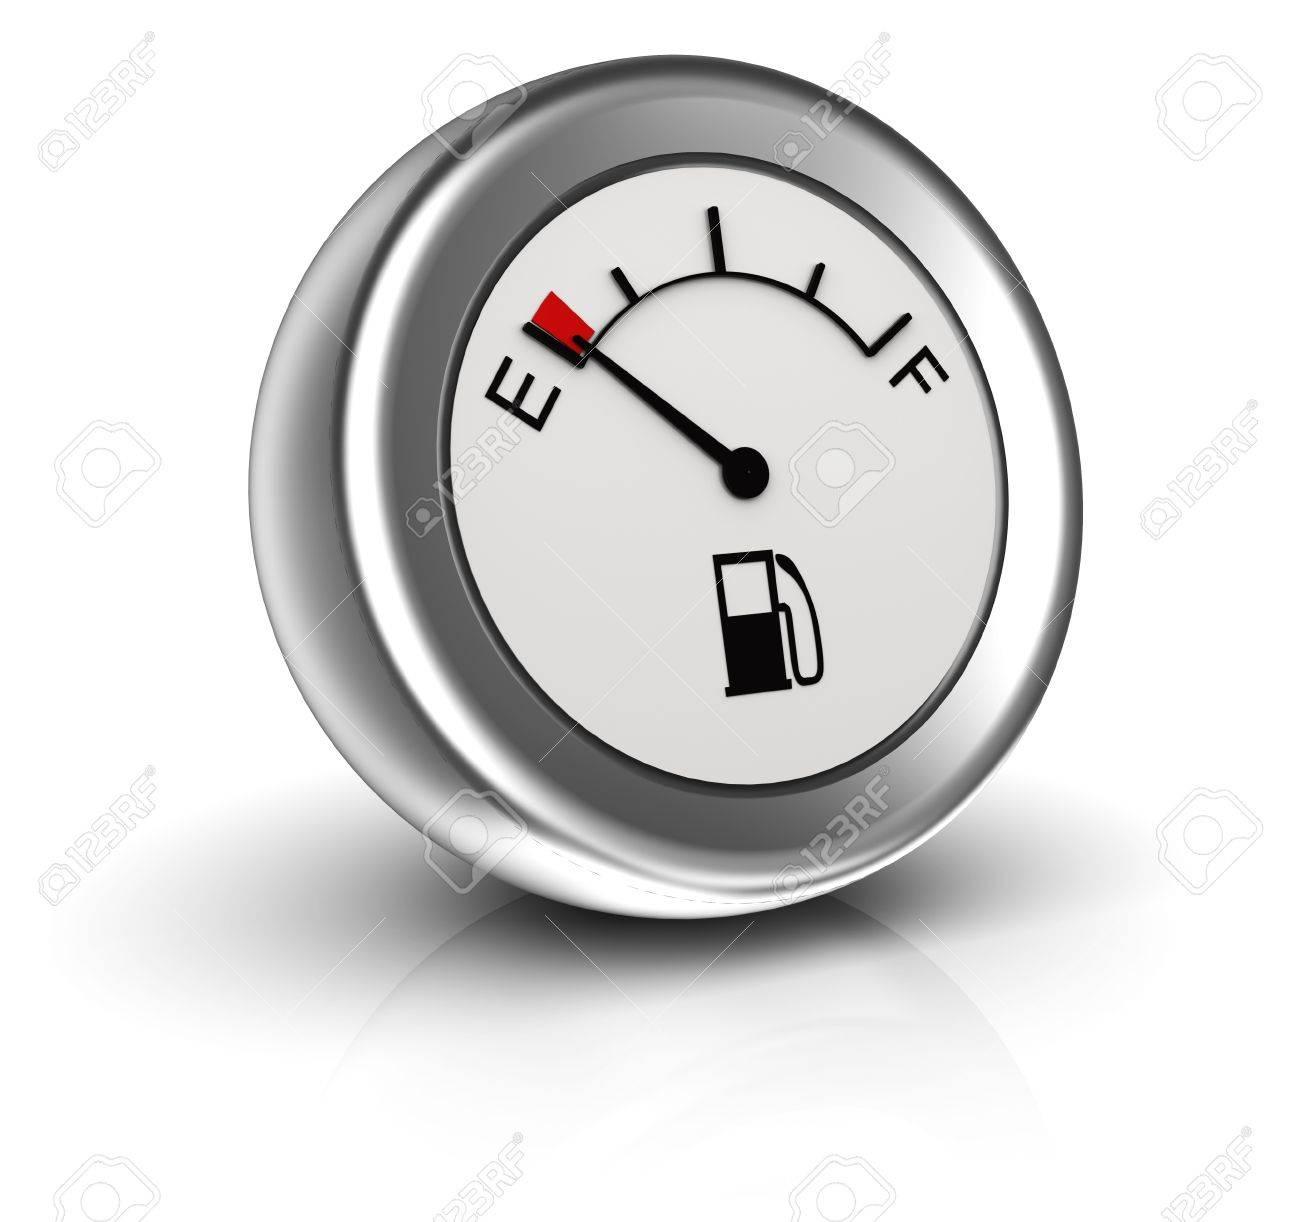 3d icon of fuel gauge indicates empty tank - 19719404